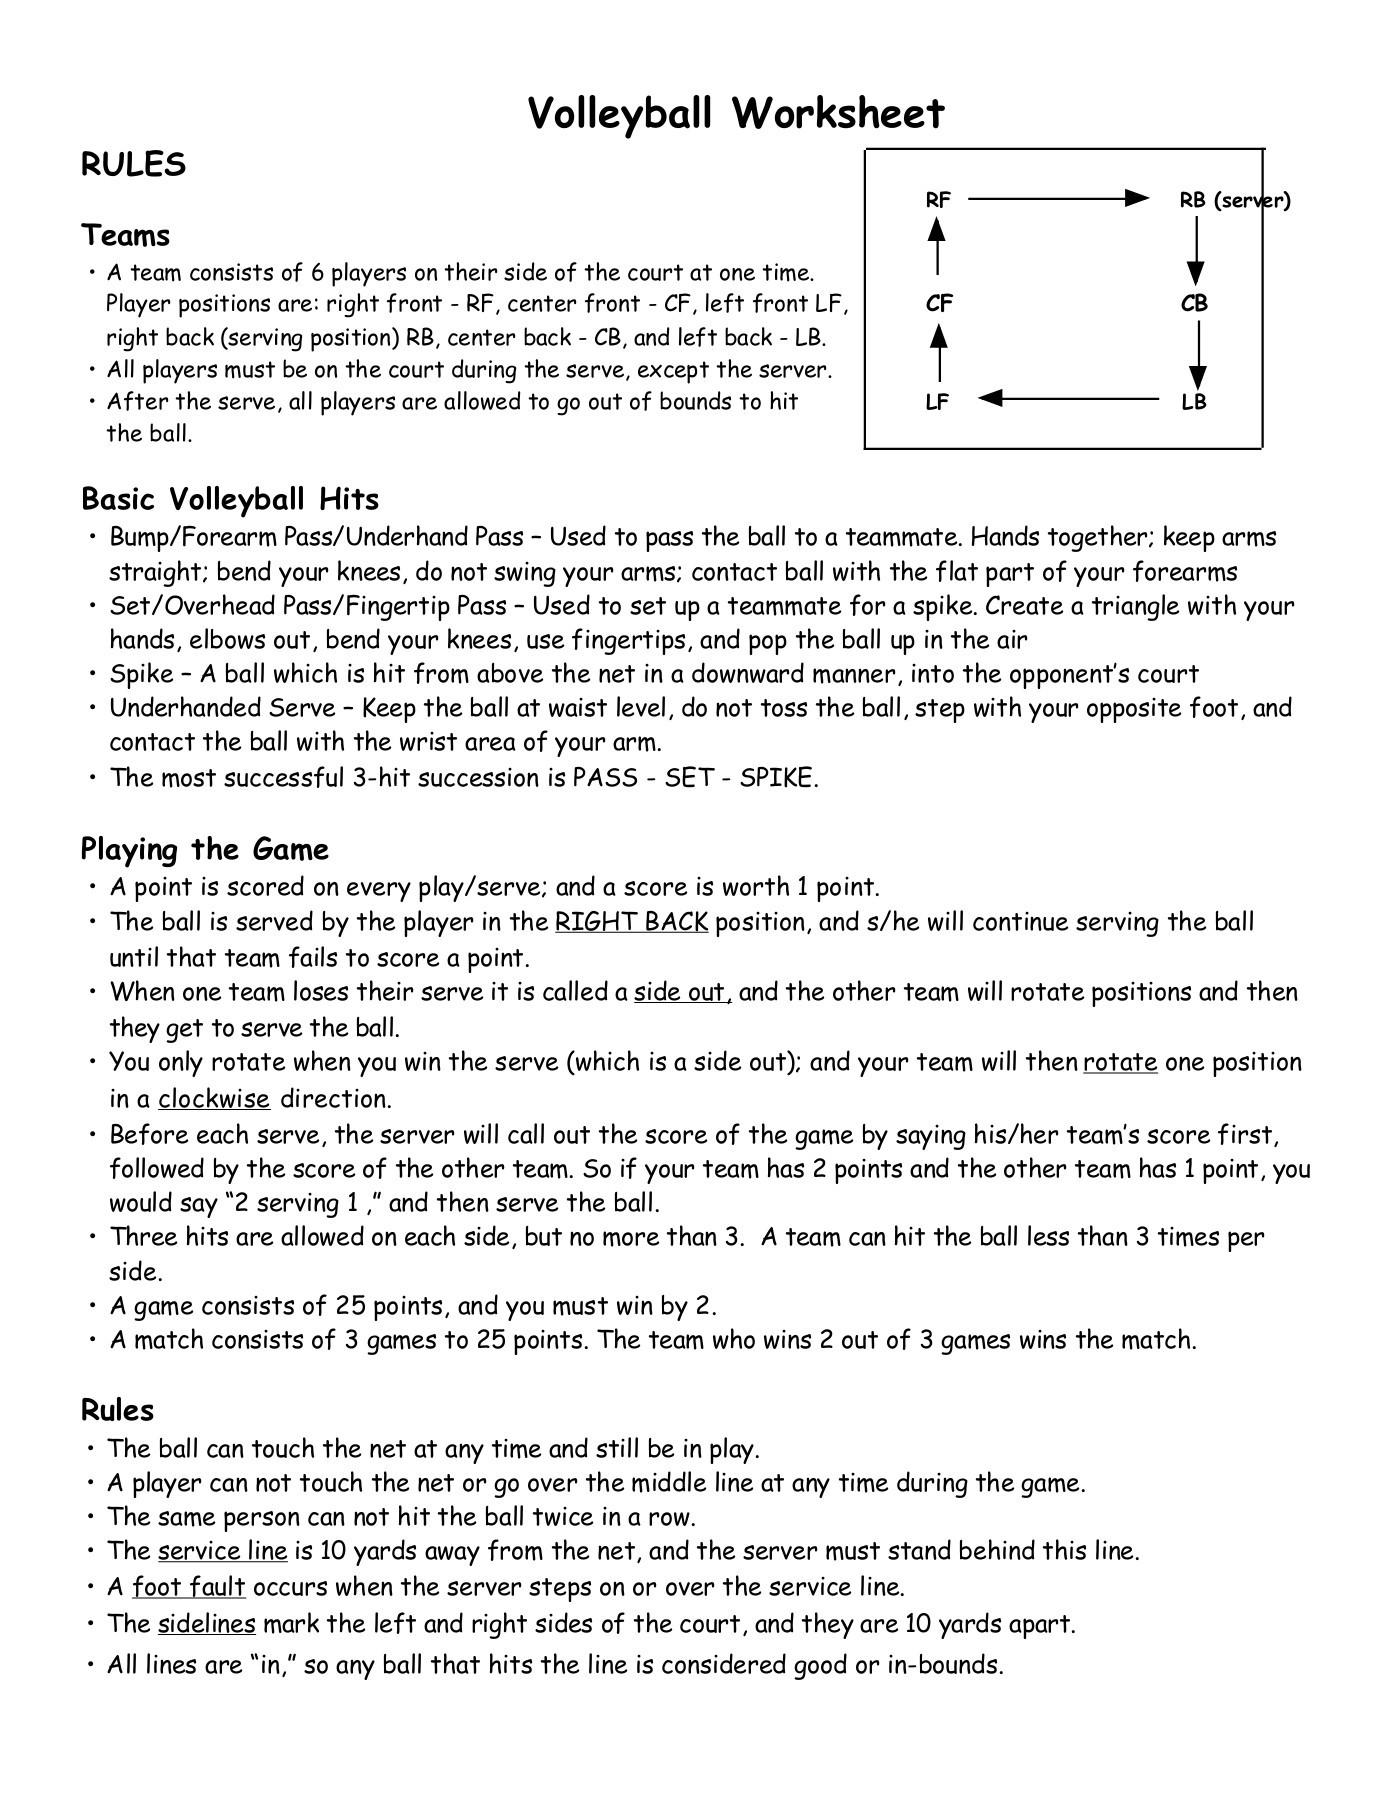 Worksheets Volleyball Worksheets Cheatslist Free